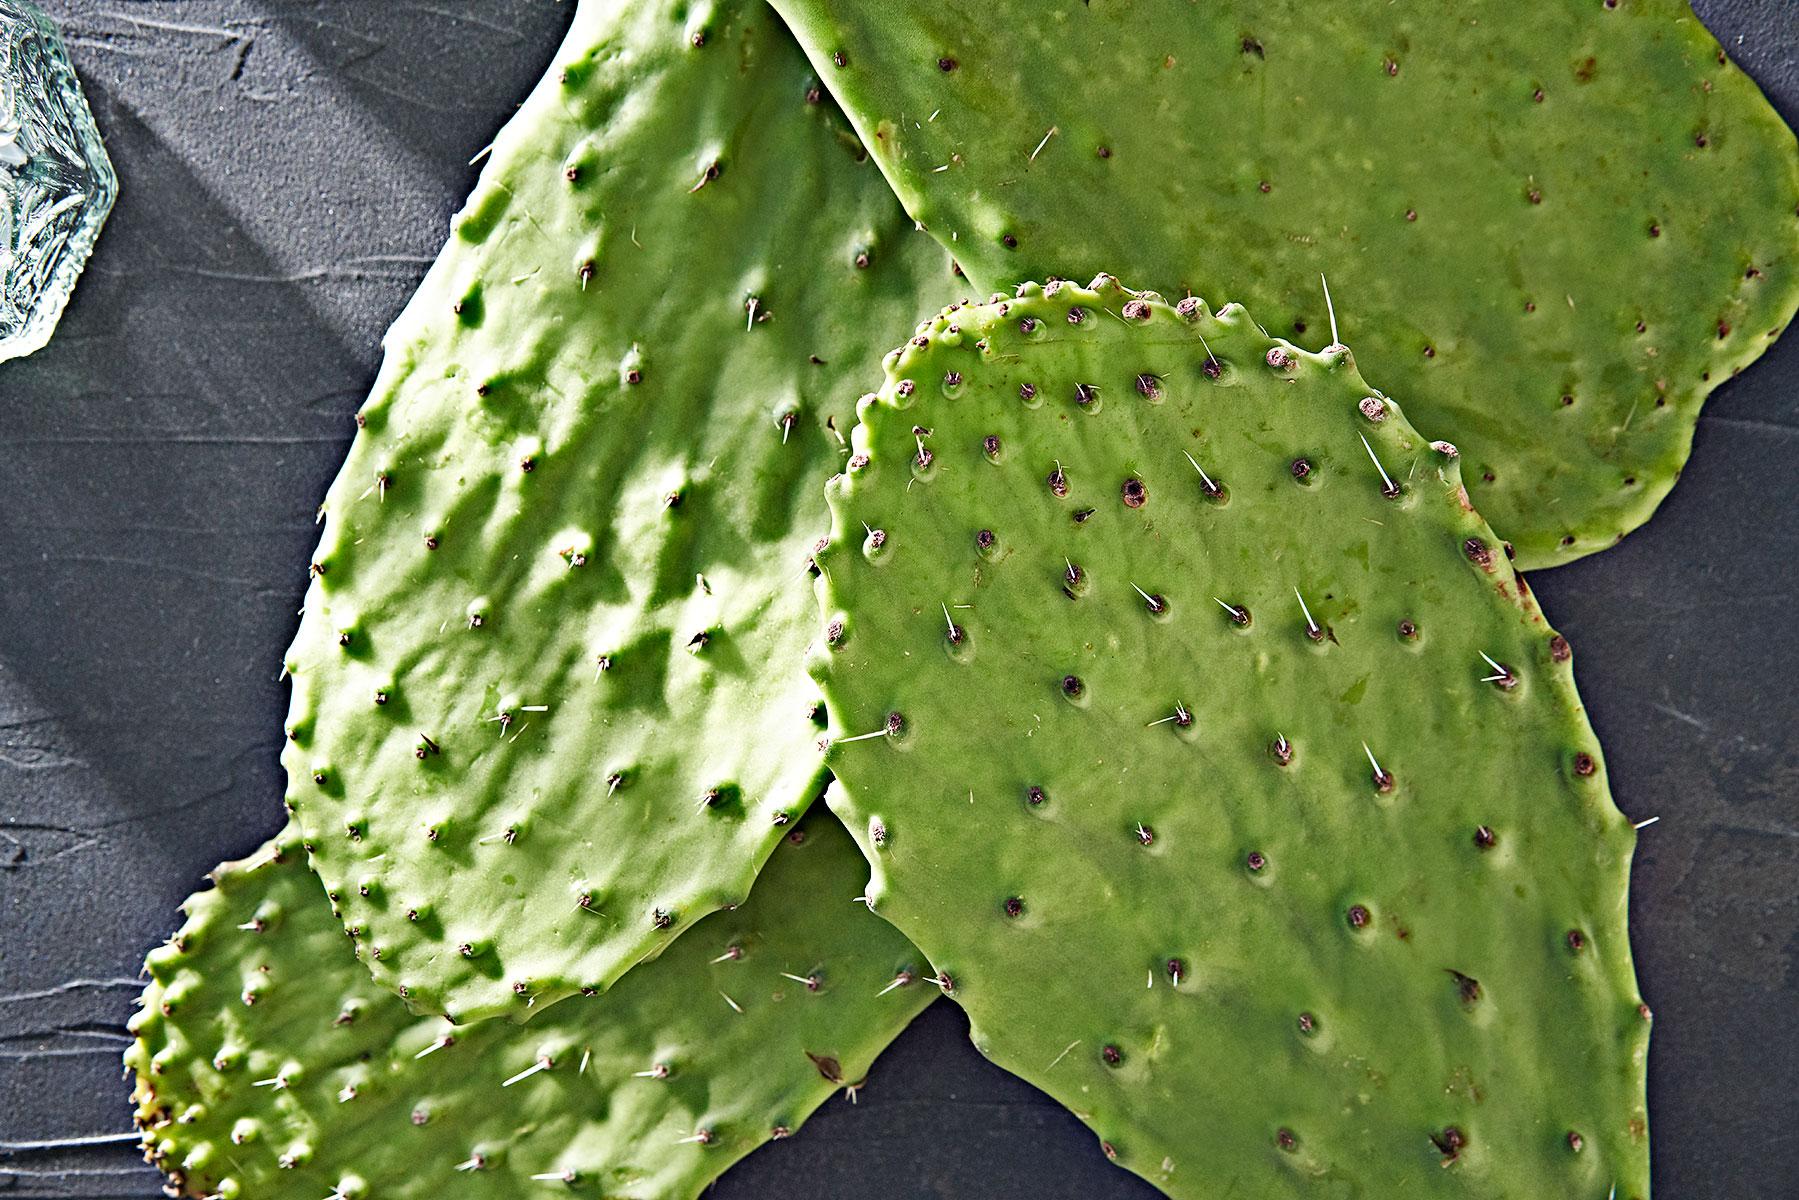 Nopales or prickly pear cactus paddles.